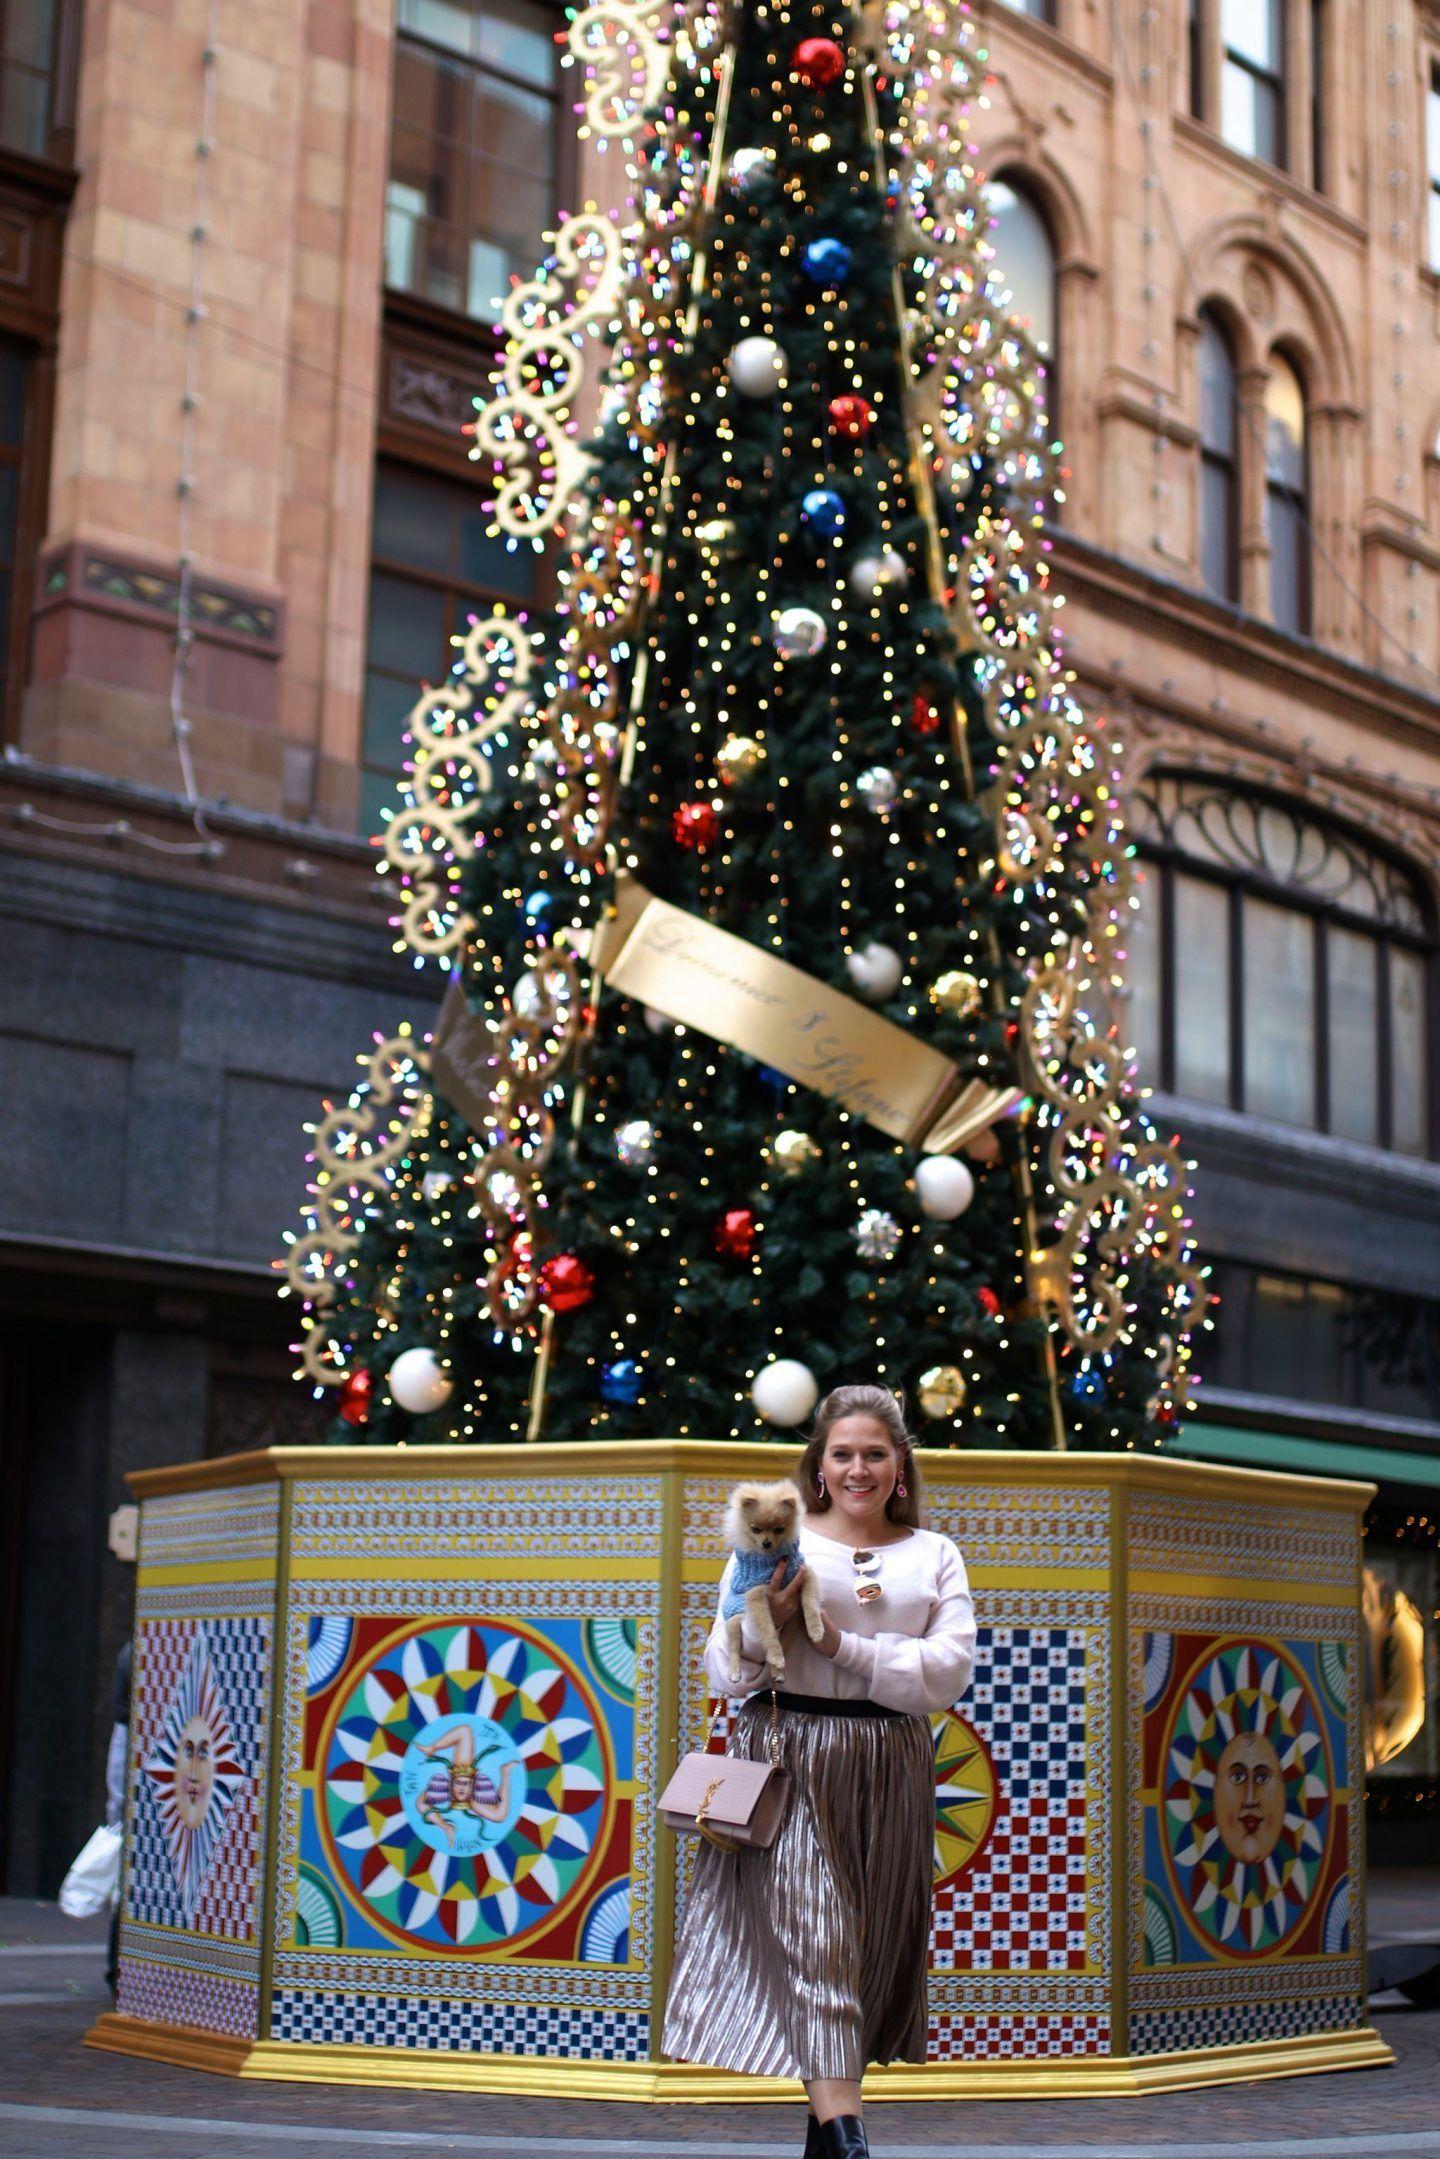 Pin by Patricia Holmes on O' Christmas trees | Christmas, Harrods ...